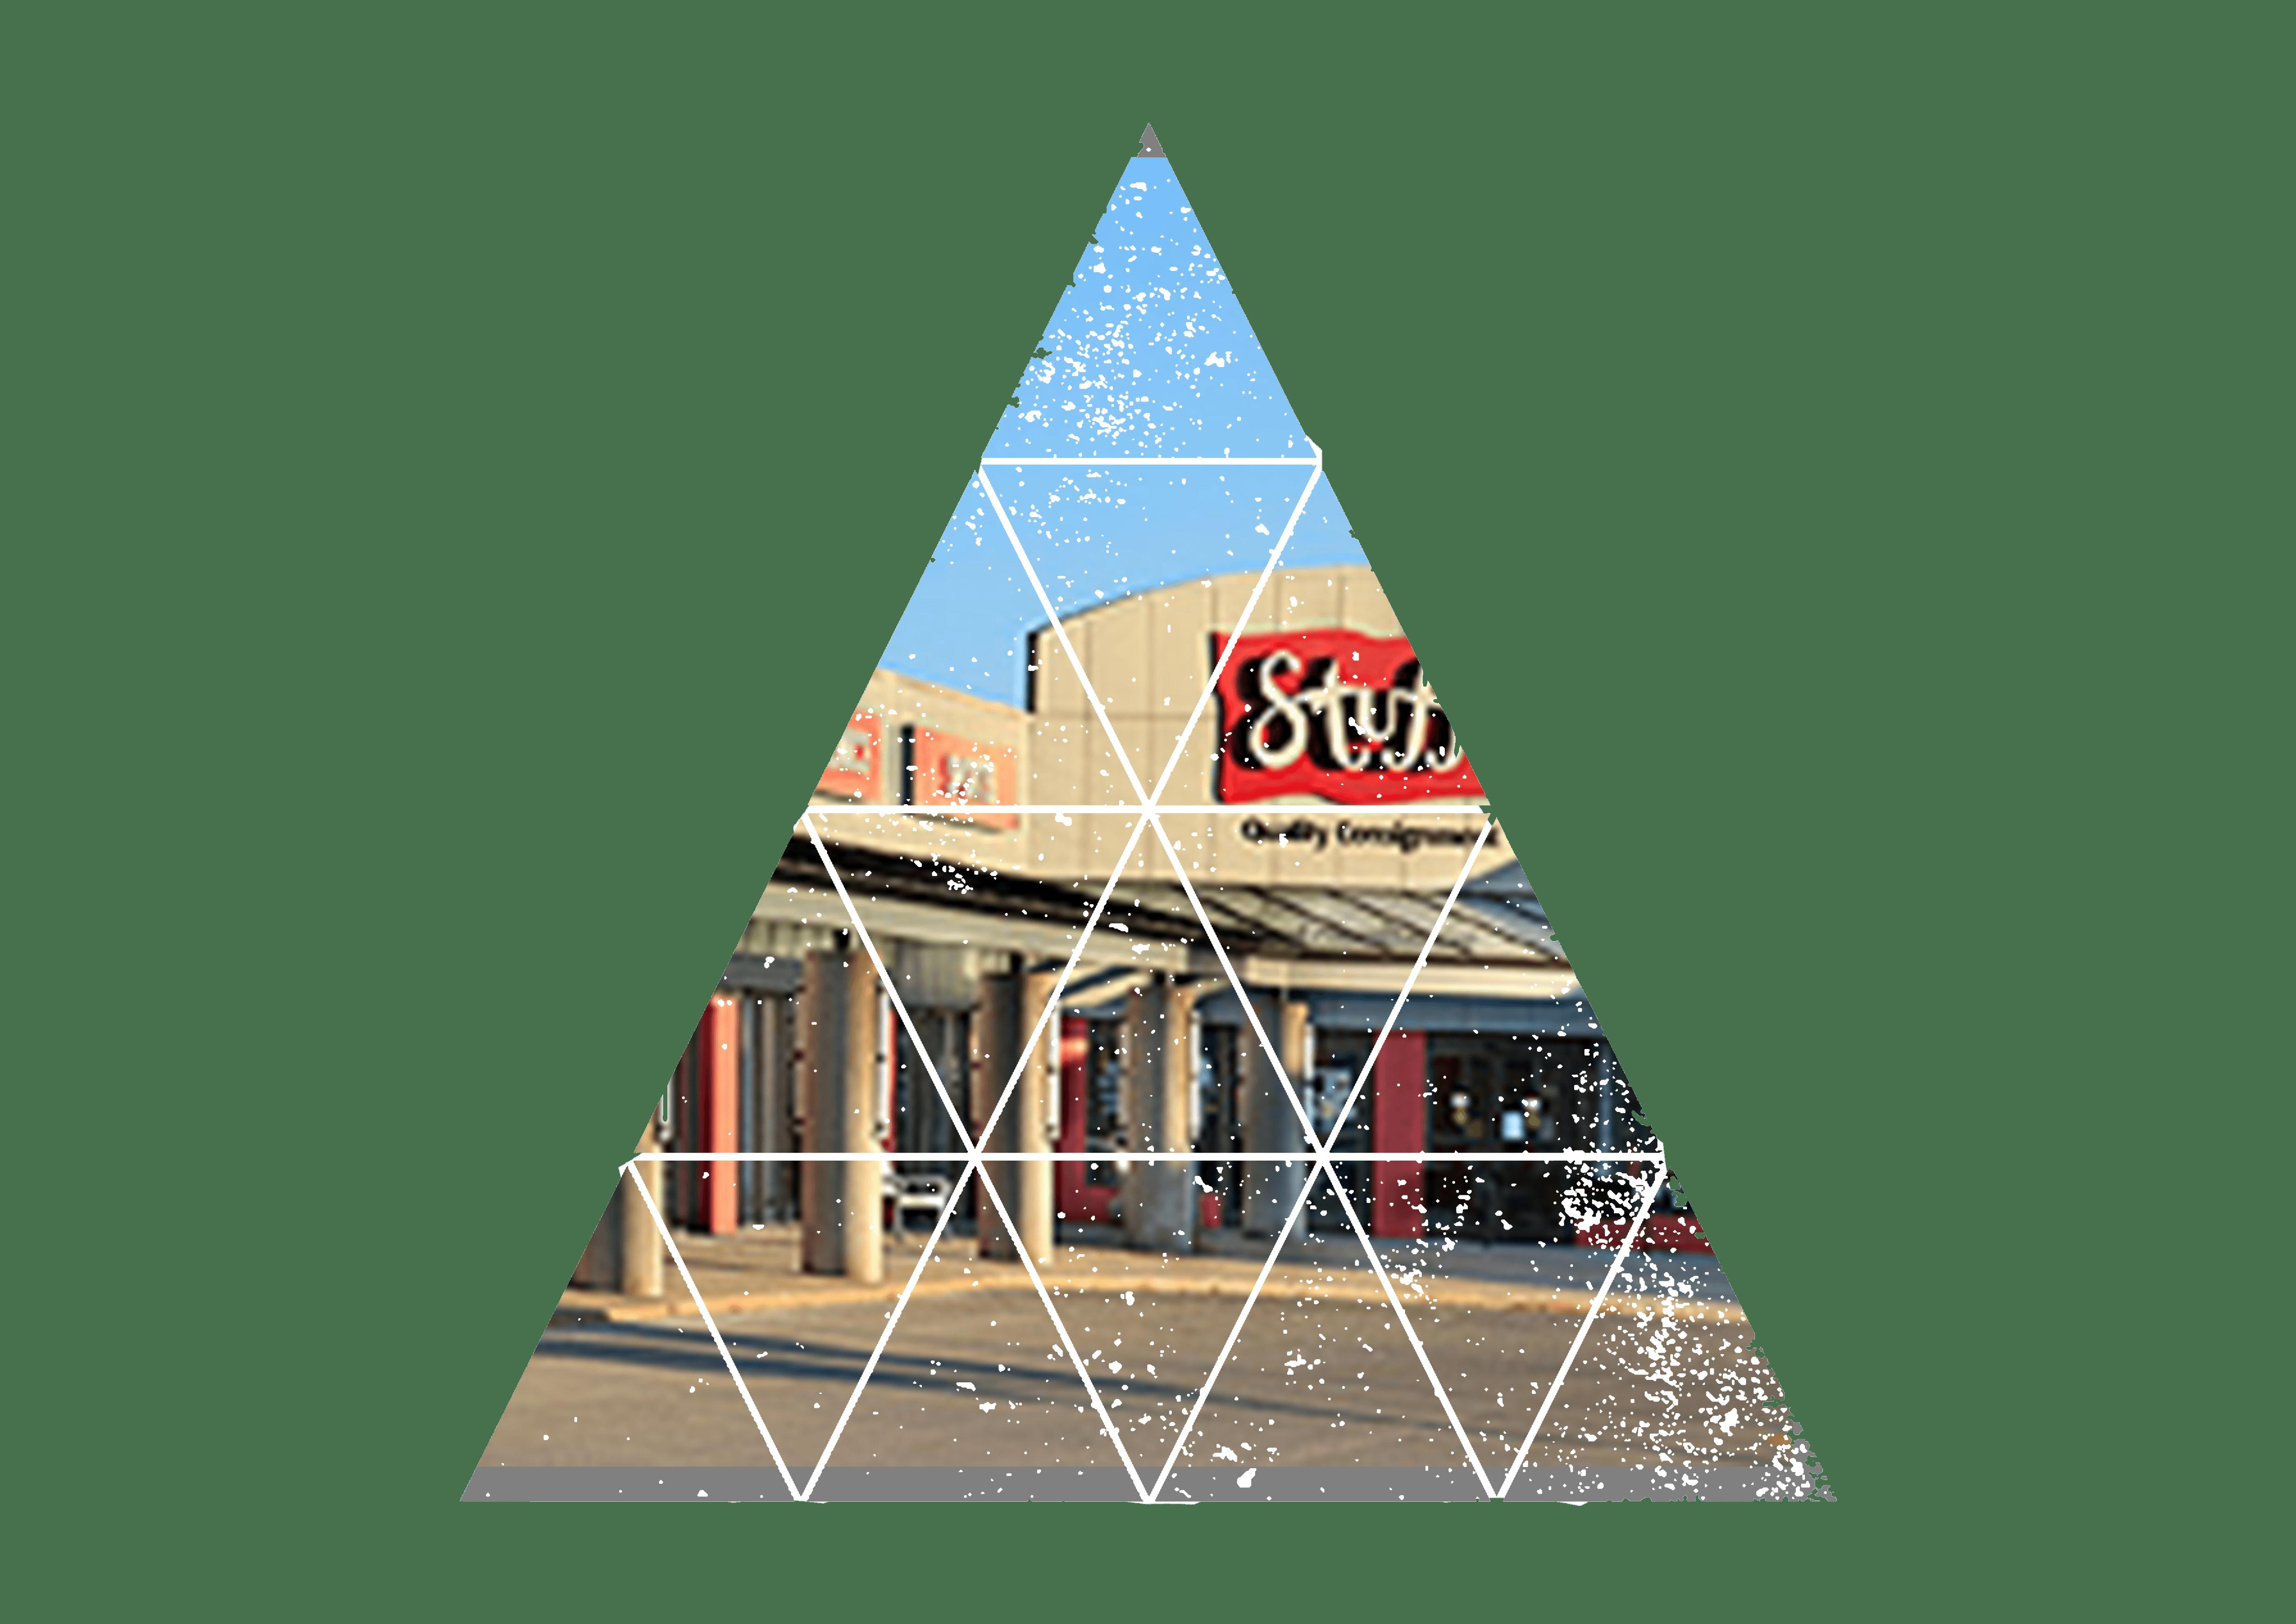 Stuff Etc. •2818 Commerce Dr, Coralville and 1027 US-6, Iowa City